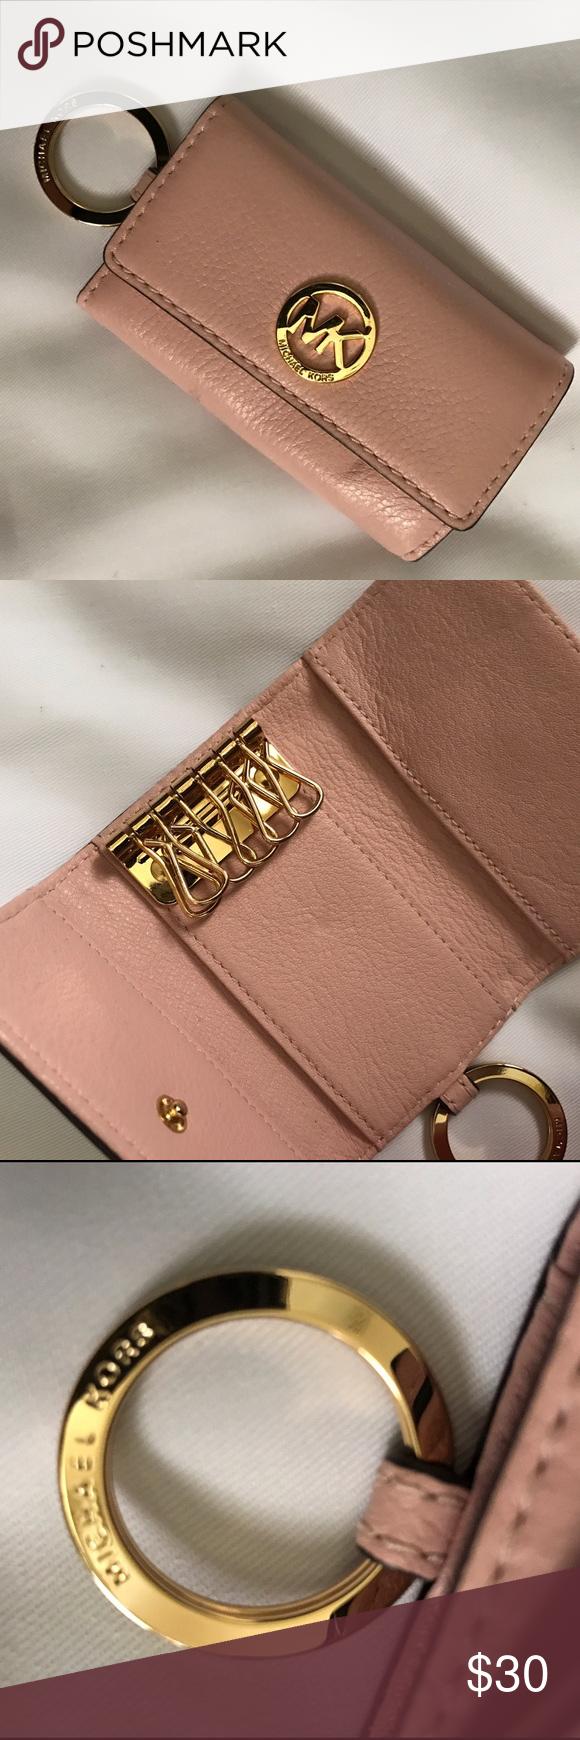 Michael Kors Multiple Key Holder Baby pink leather key chain